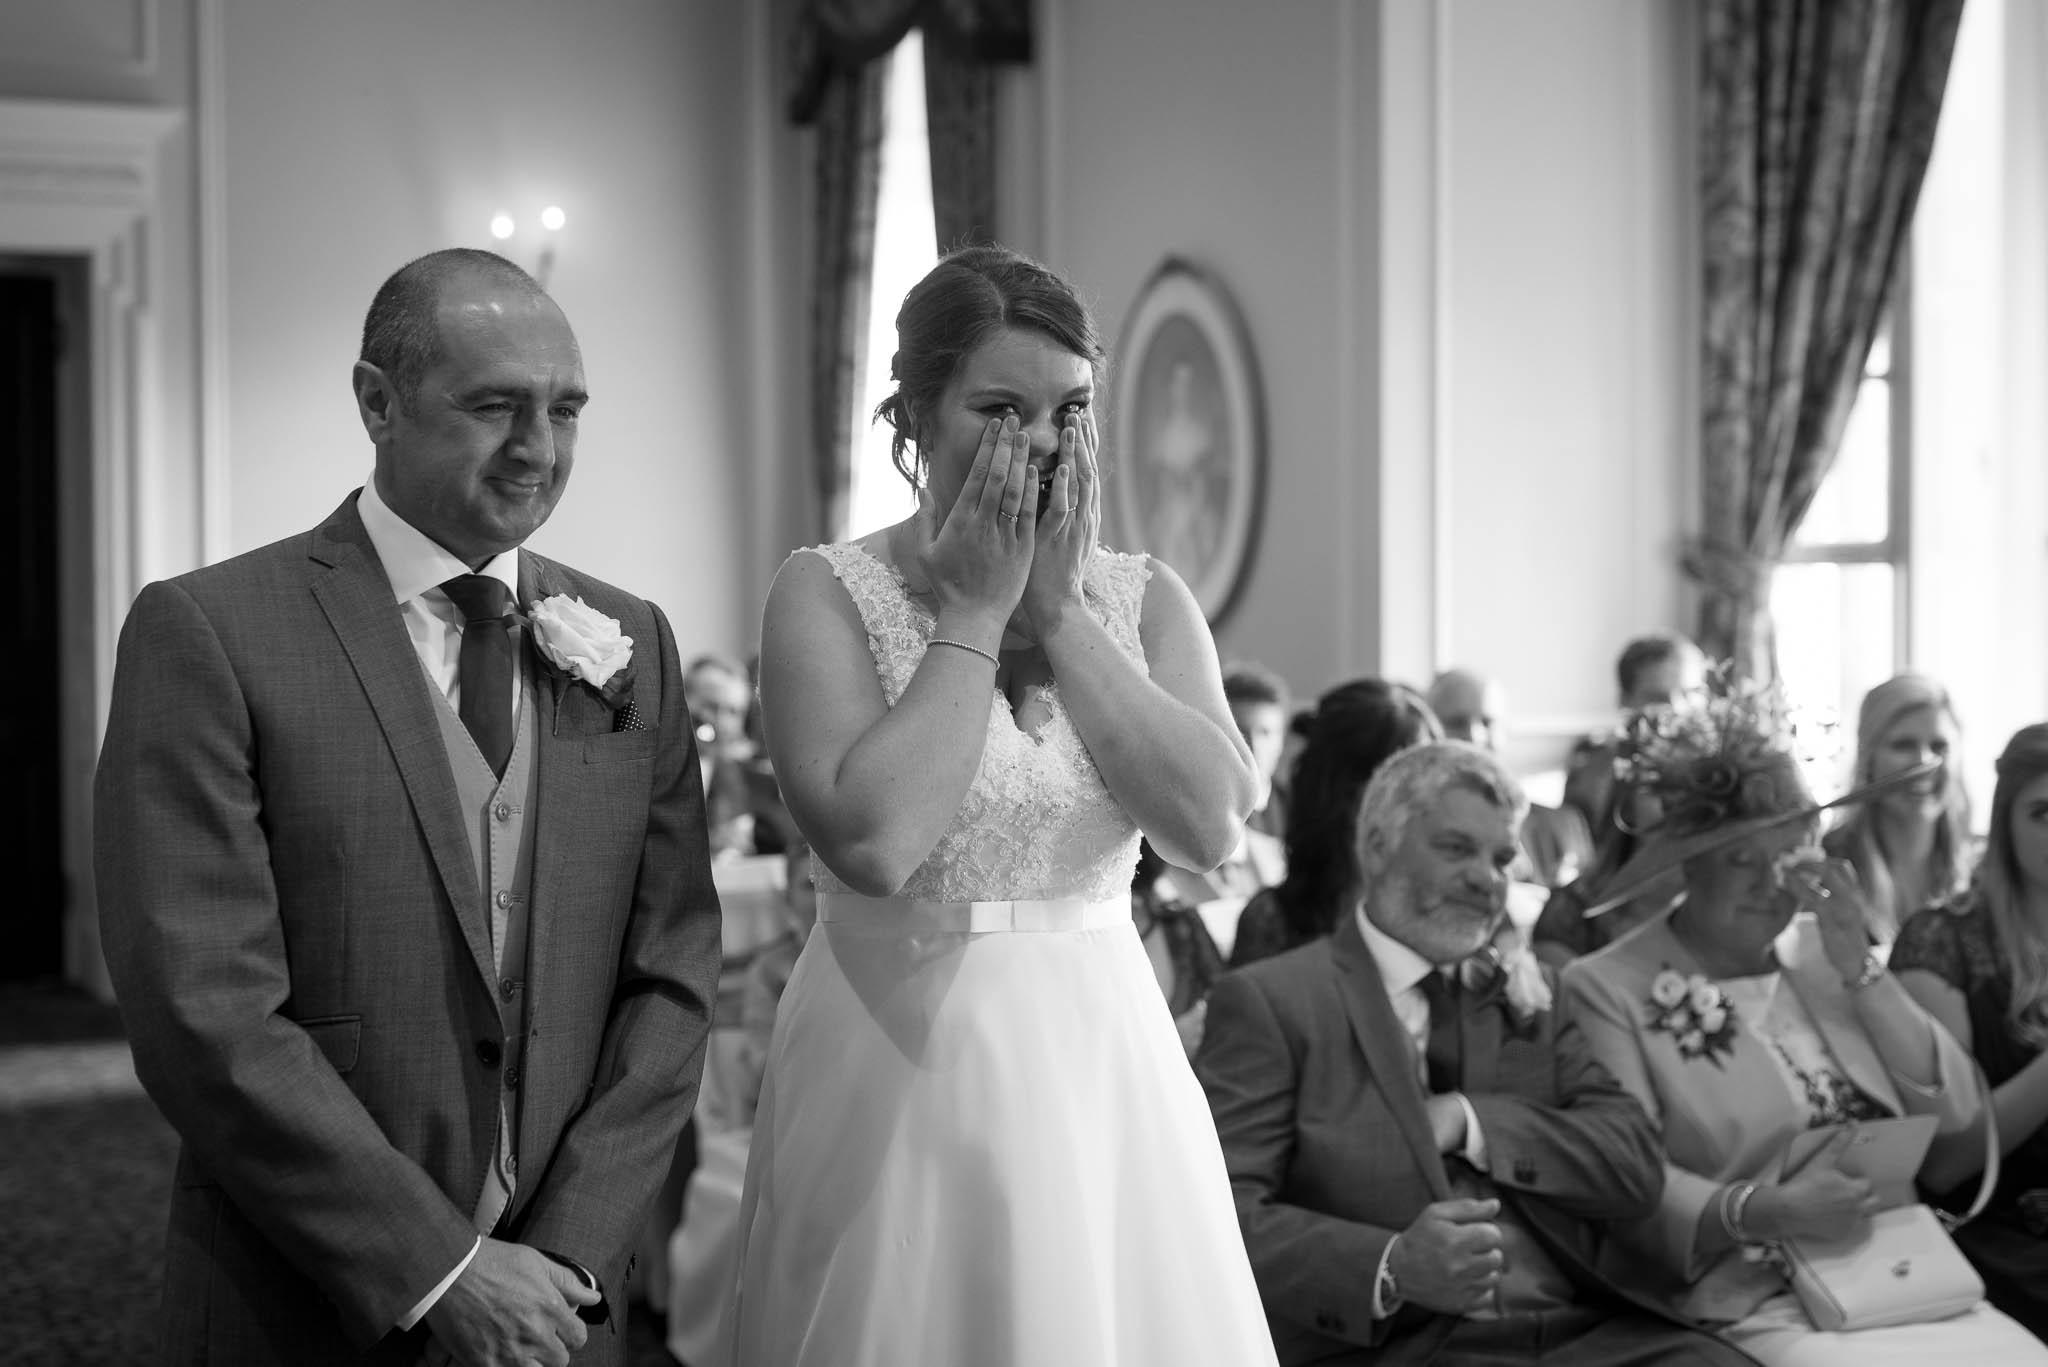 Crathorne Hall Hotel Wedding Photographer57.jpg